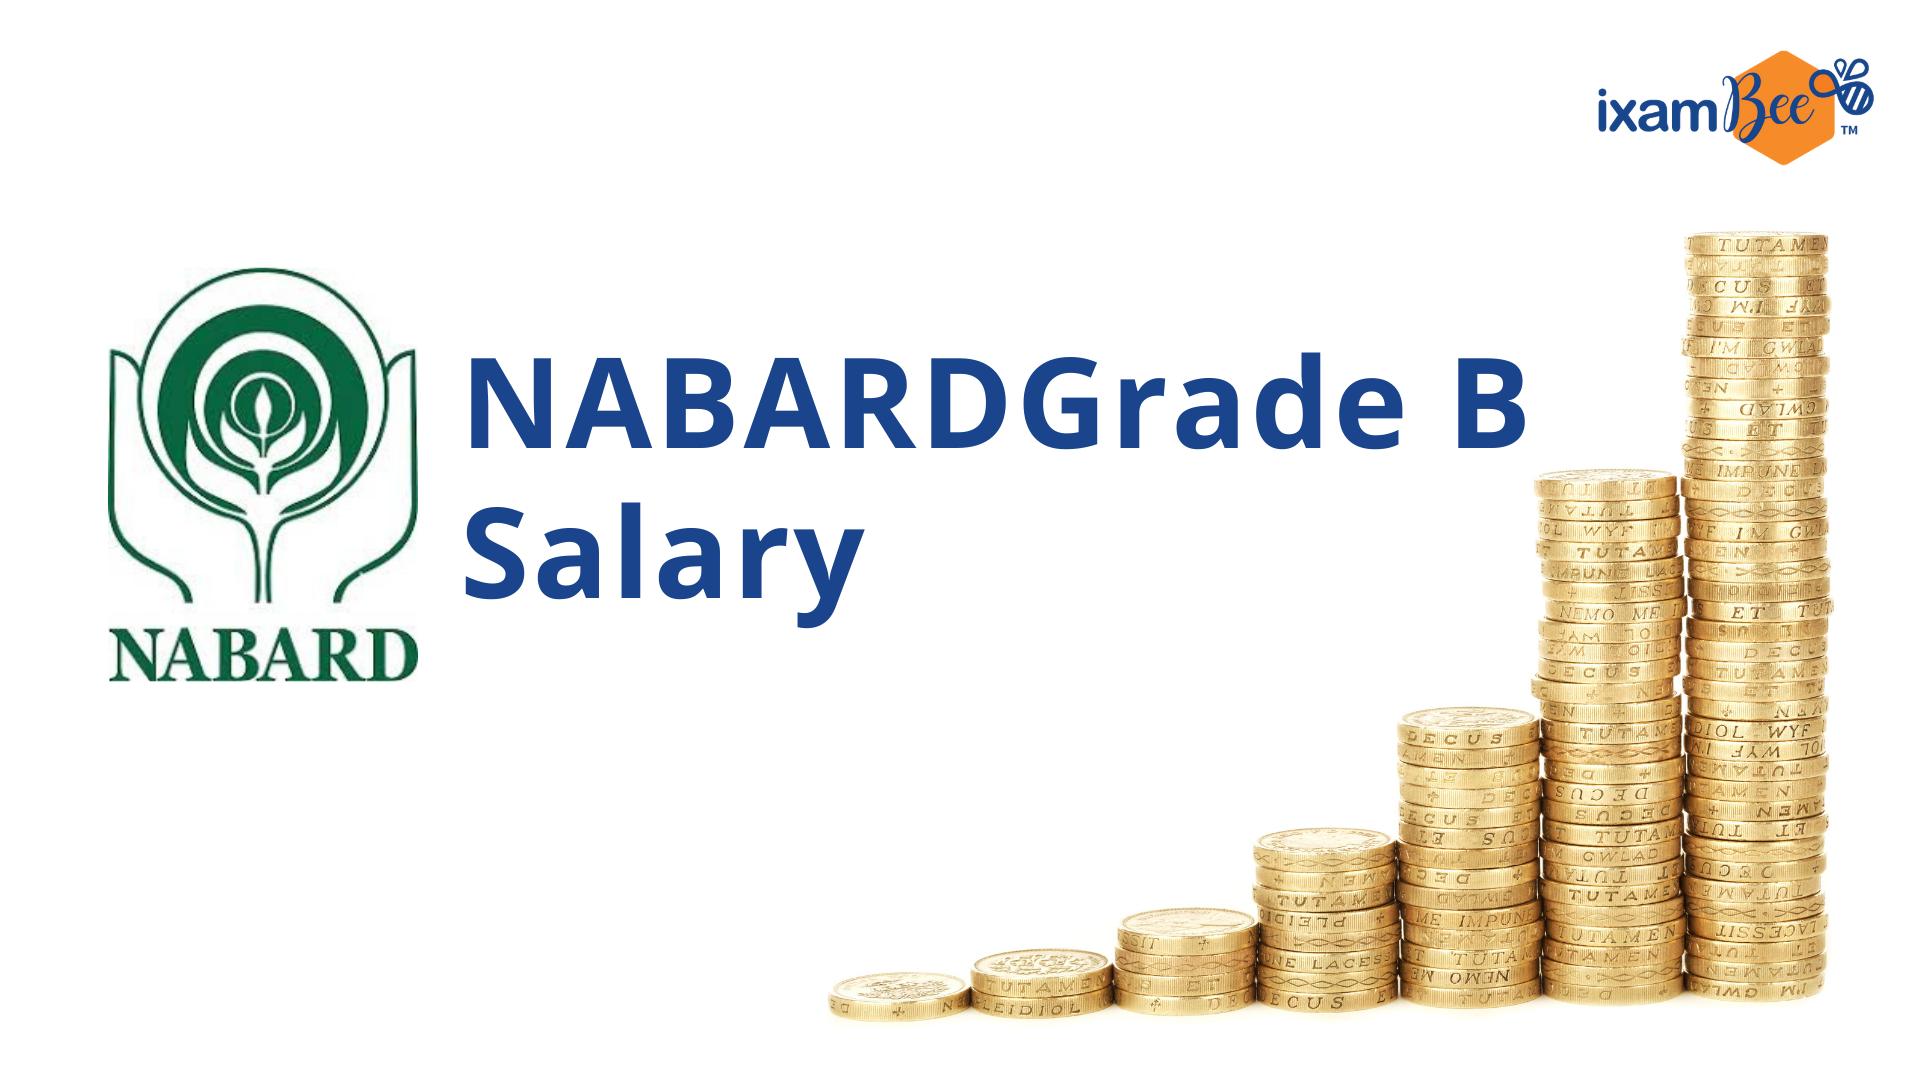 NABARD Grade B Salary